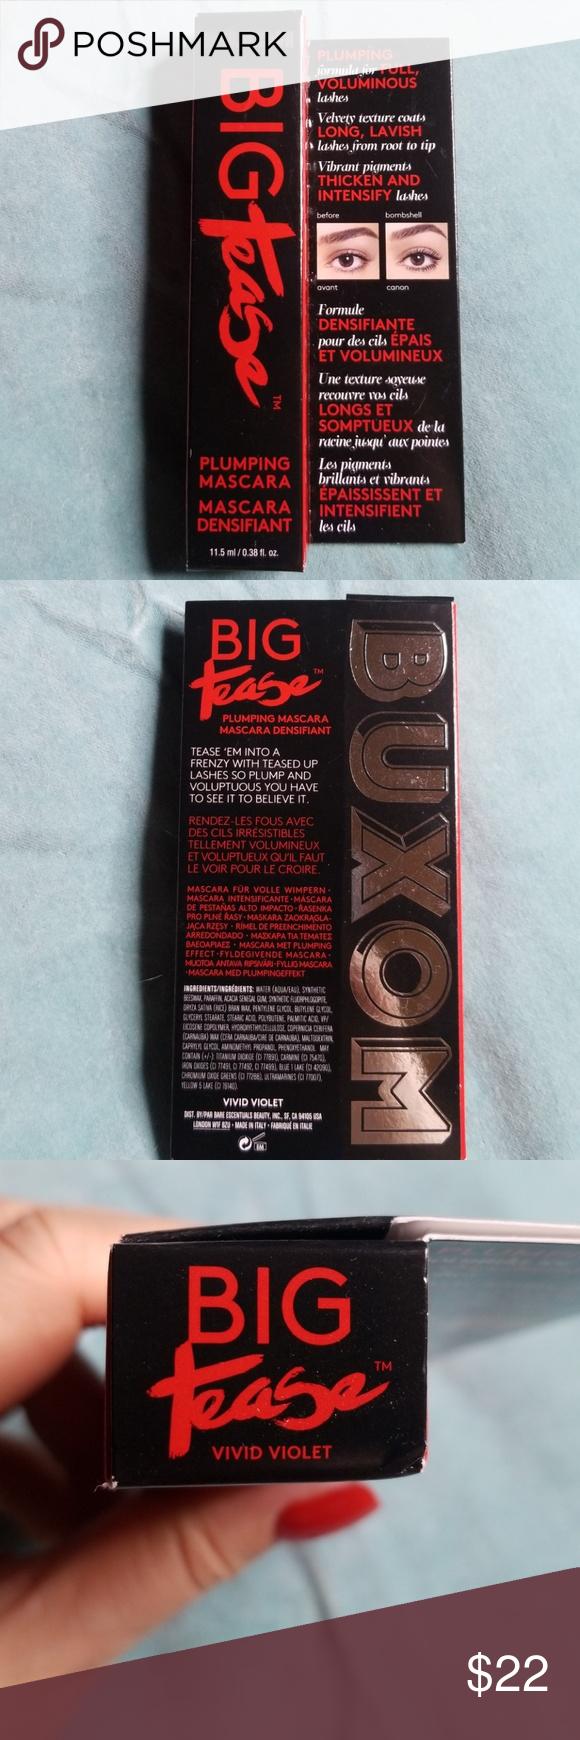 82bf4e680ce Buxom big tease plumping mascara Full size nib never opened vivid violet  color Buxom Makeup Mascara